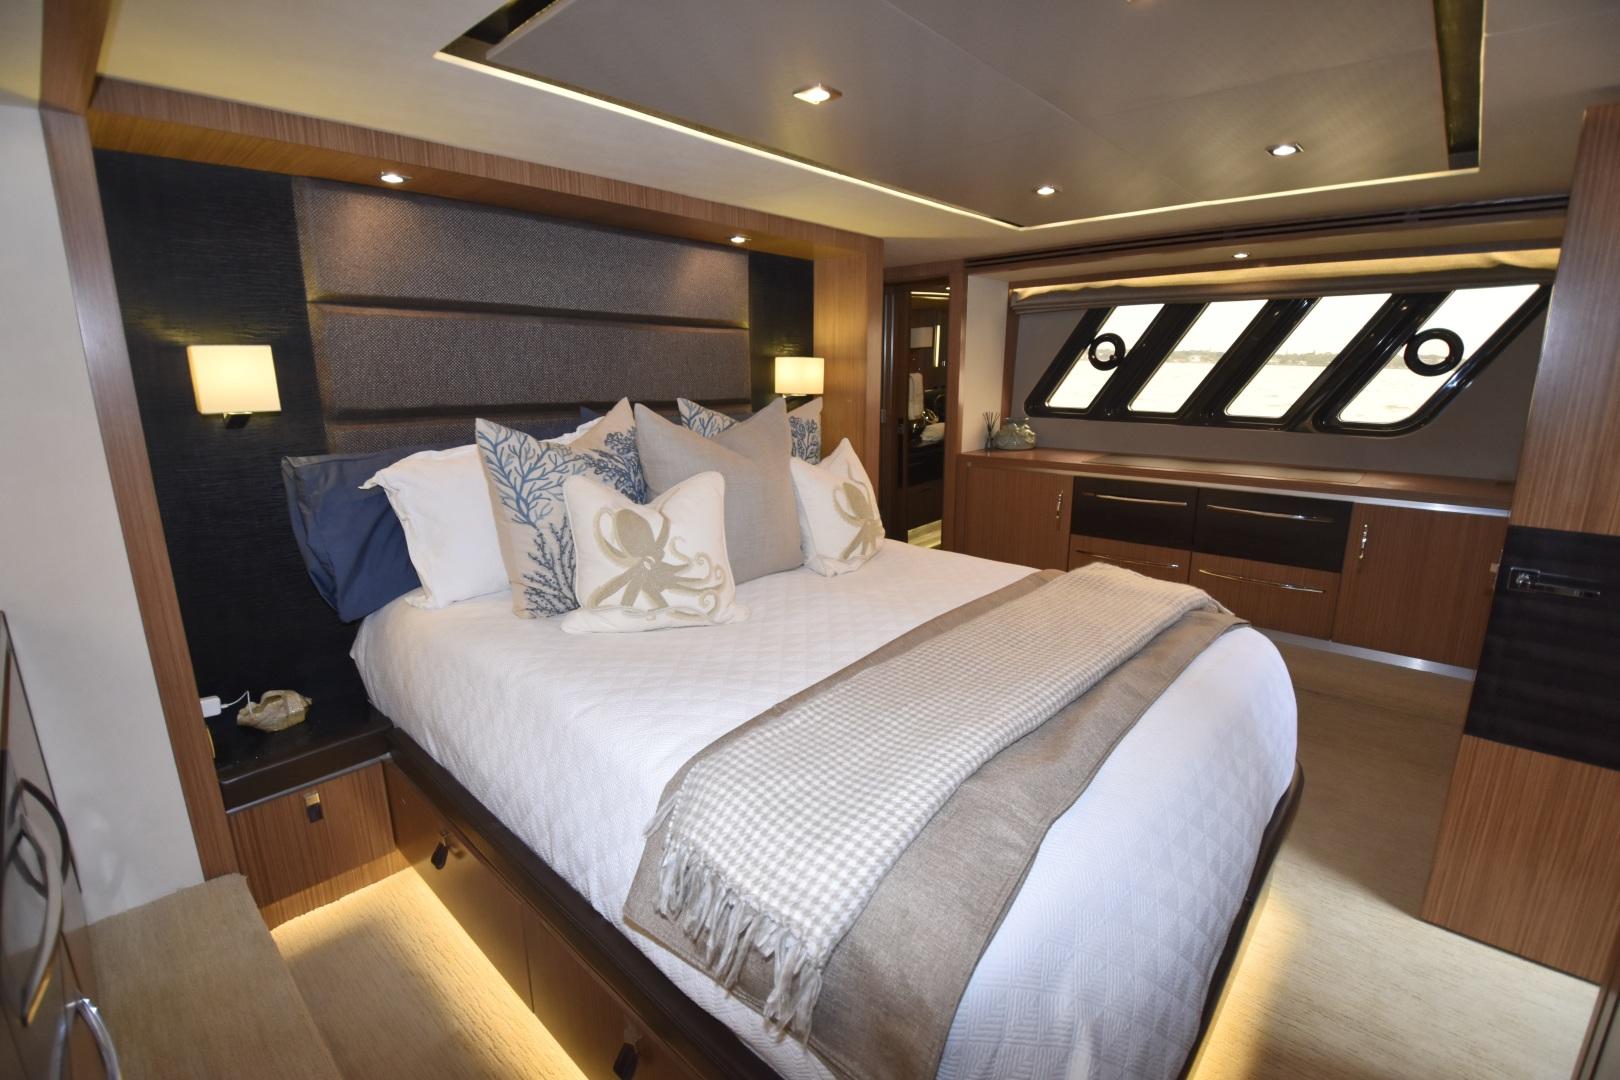 Sea Ray-L650 2016-3x's the Charm Longboat Key-Florida-United States-2016 Sea Ray L650  3x's the Charm  Master Stateroom-1251811 | Thumbnail